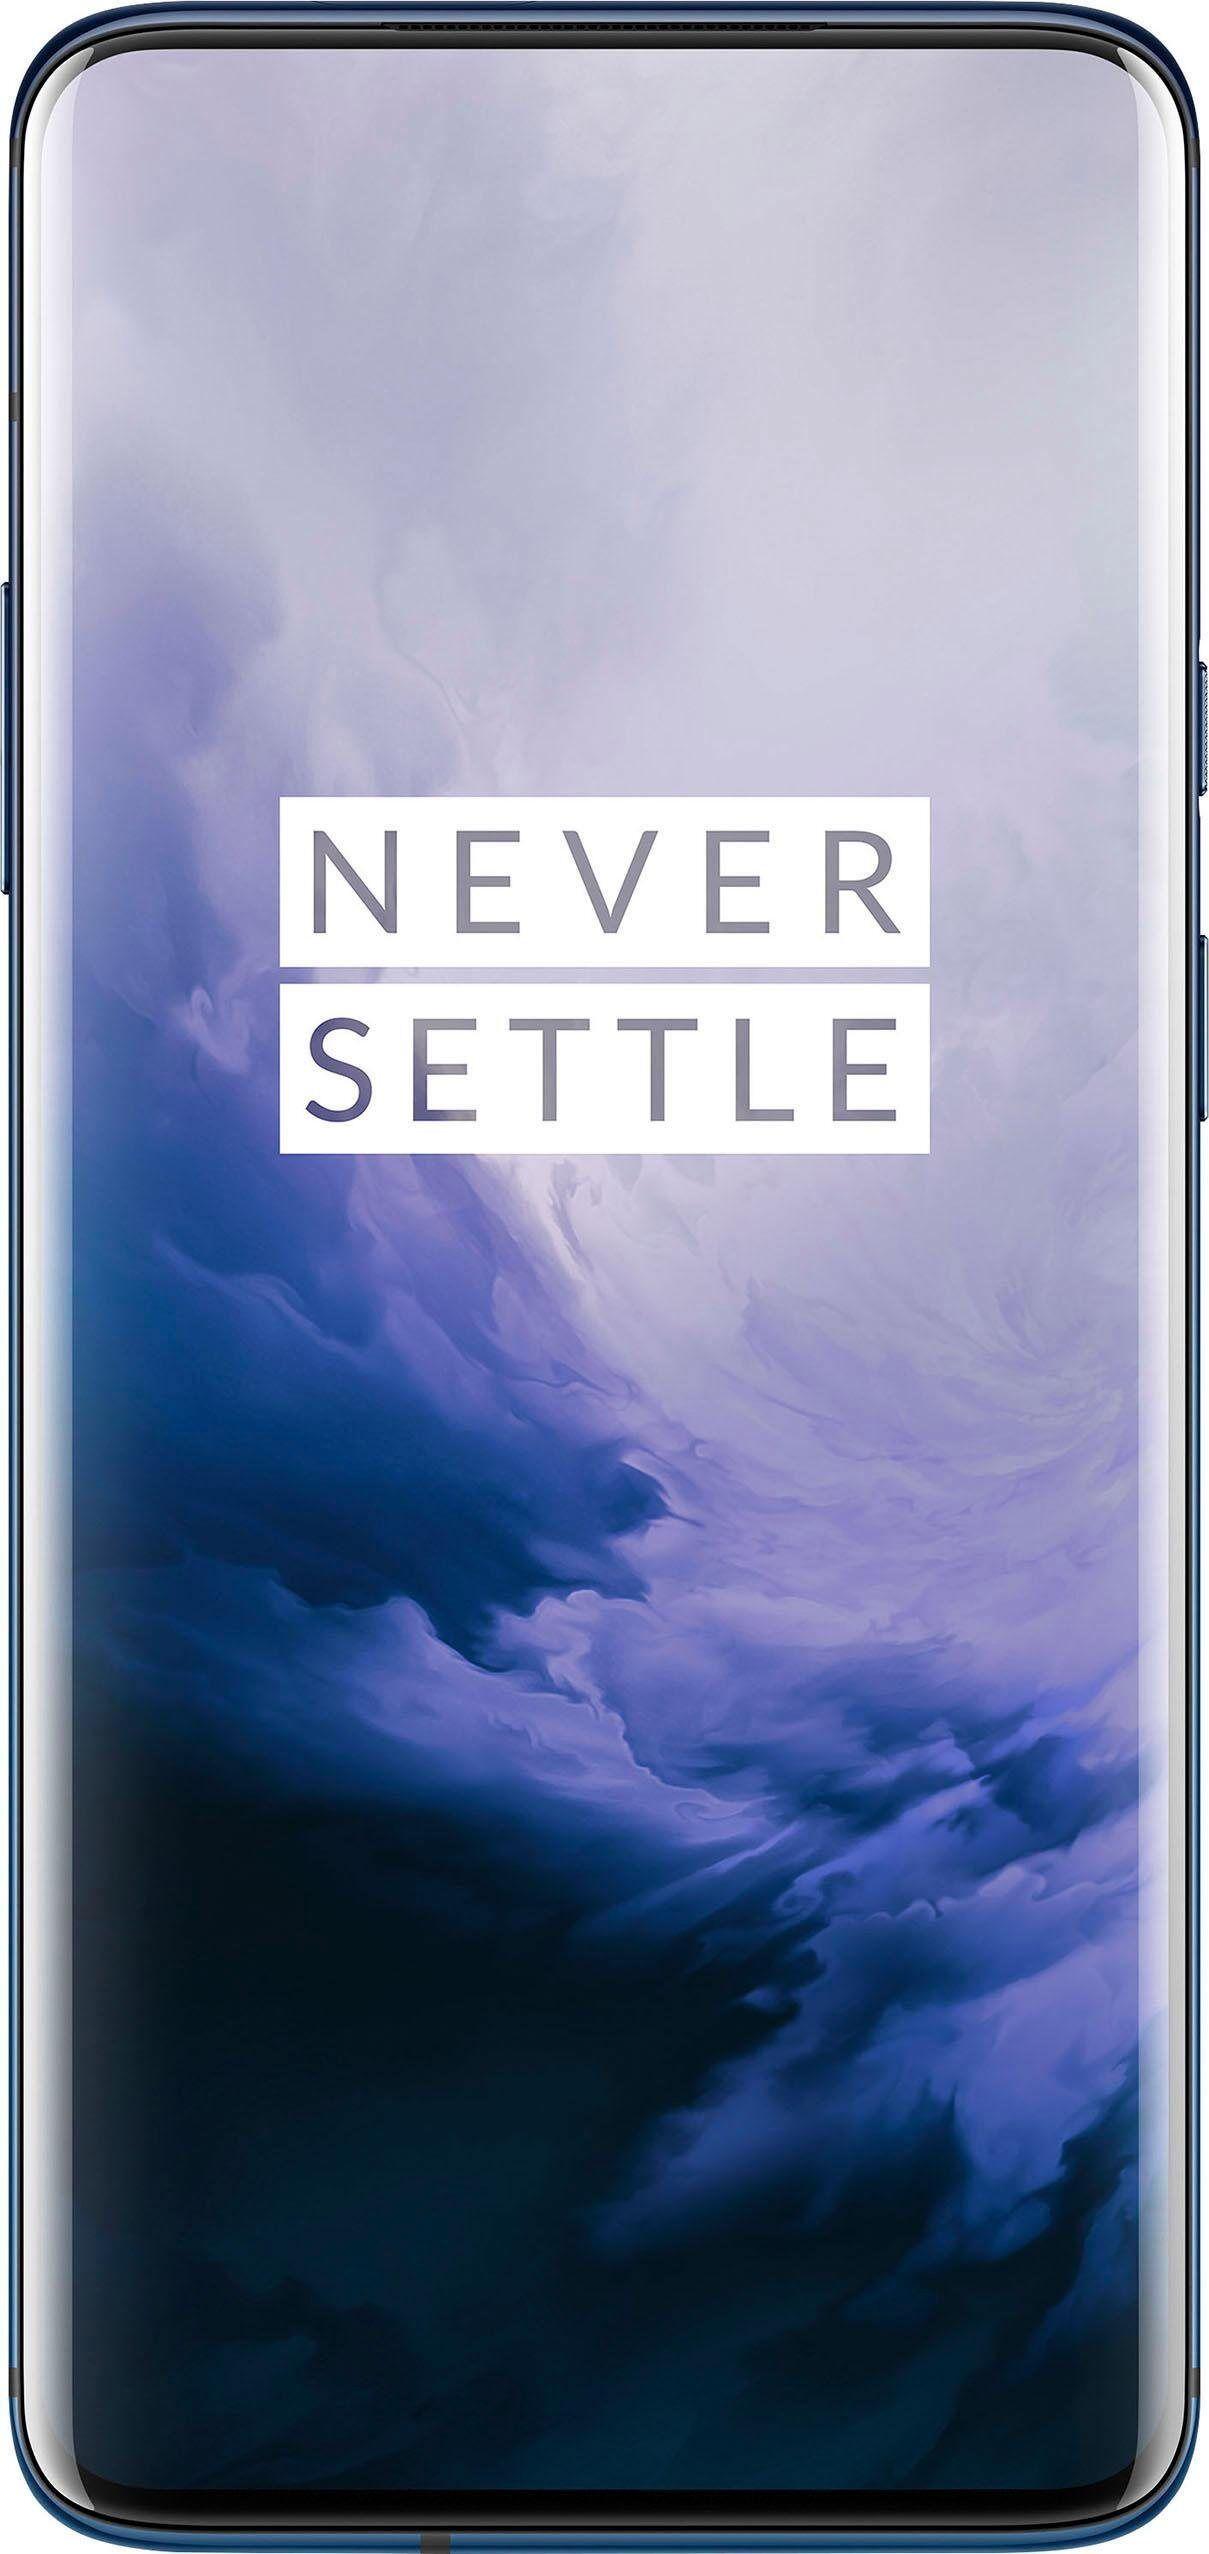 OnePlus 7 Pro 8GB+256GB Smartphone (16,9 cm/6,7 Zoll, 256 GB Speicherplatz, 48 MP Kamera), nebula blue